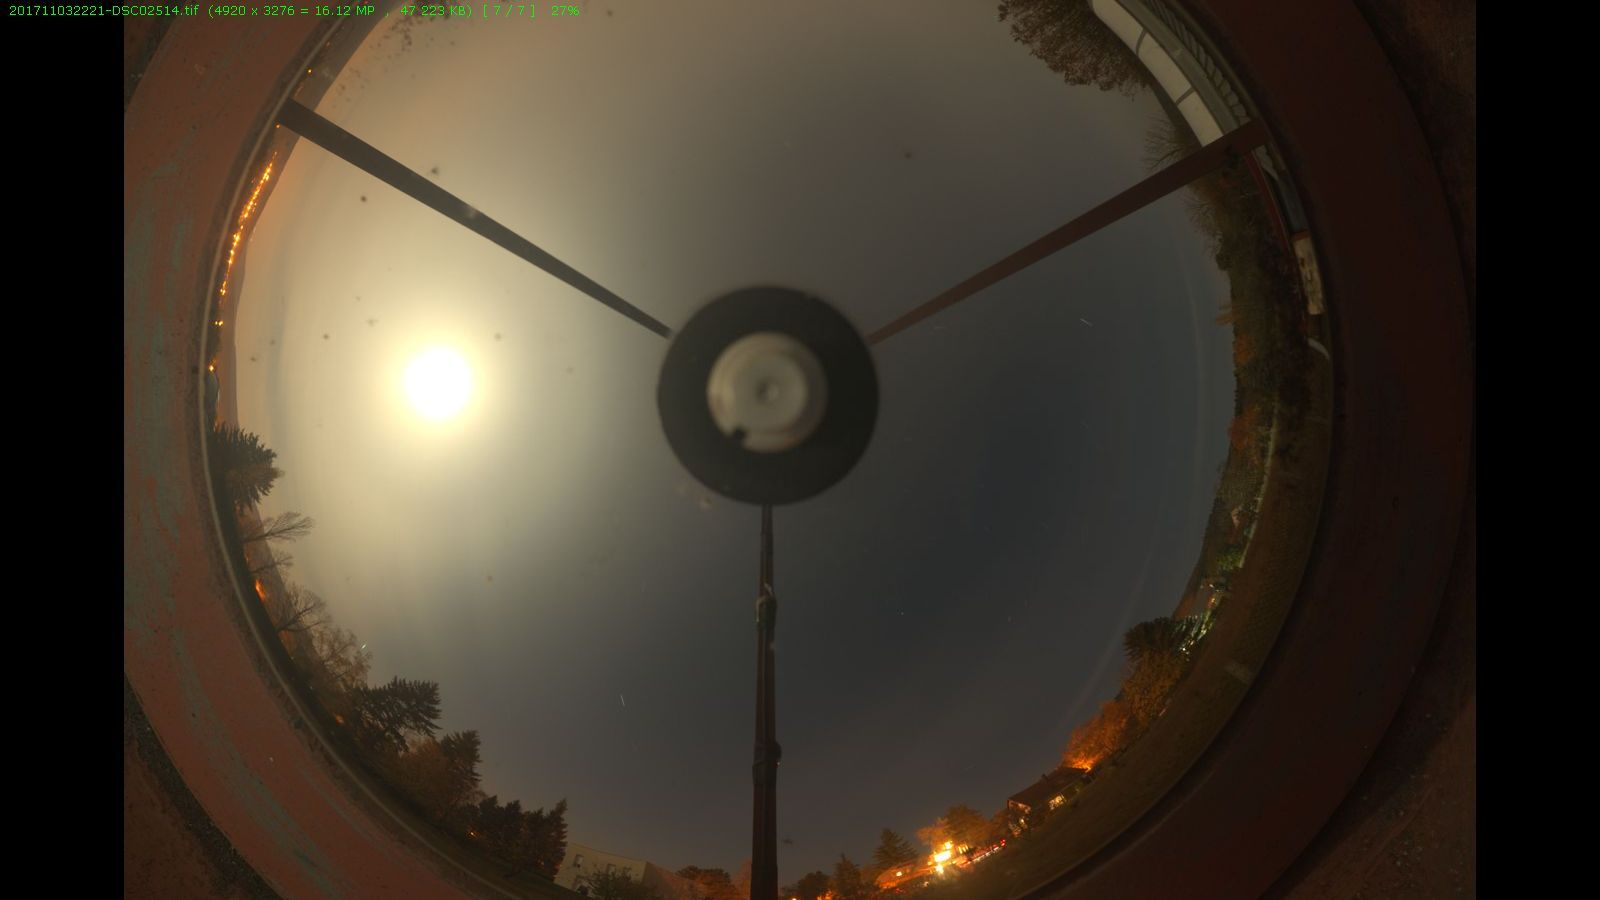 Planetumforschung 2017 11 03